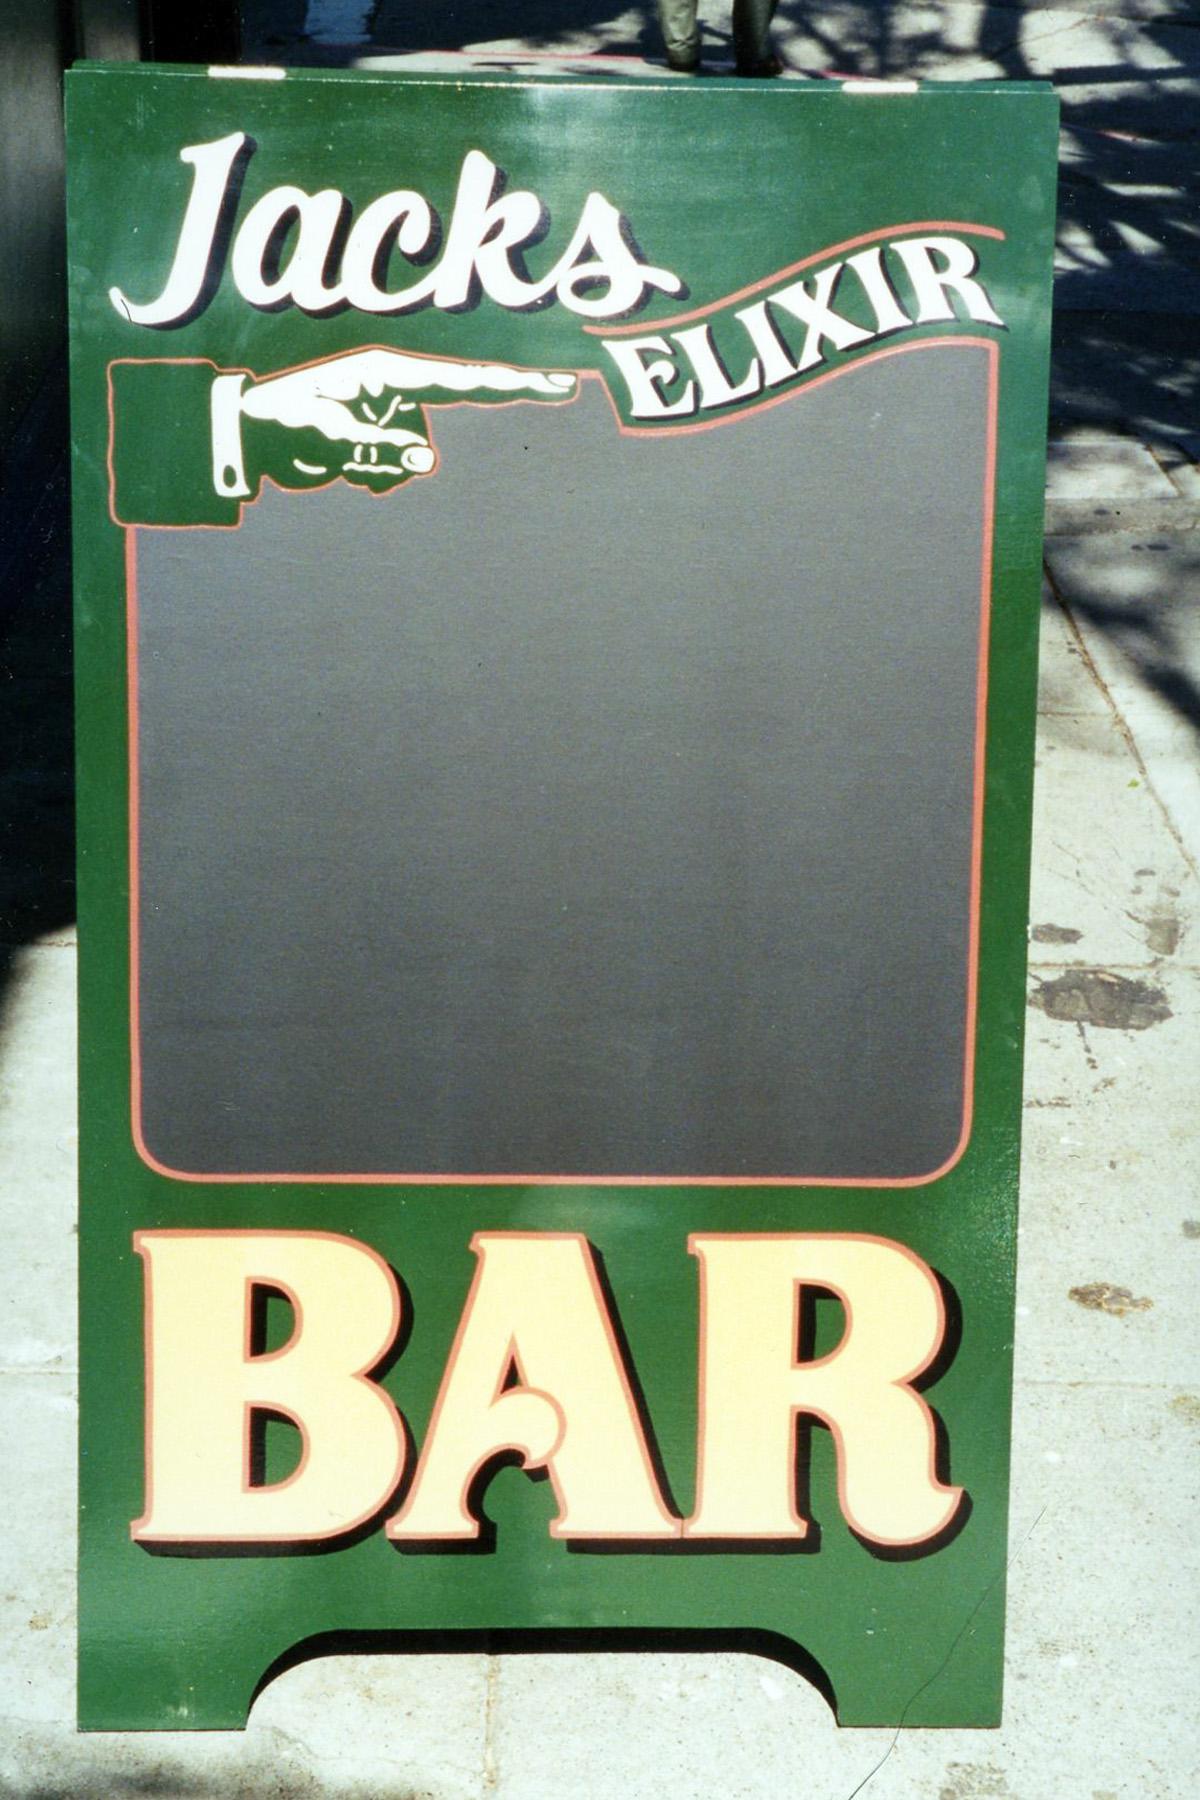 A-FRAME-jacks-bar-sandwich-board_5959219346_o.jpg